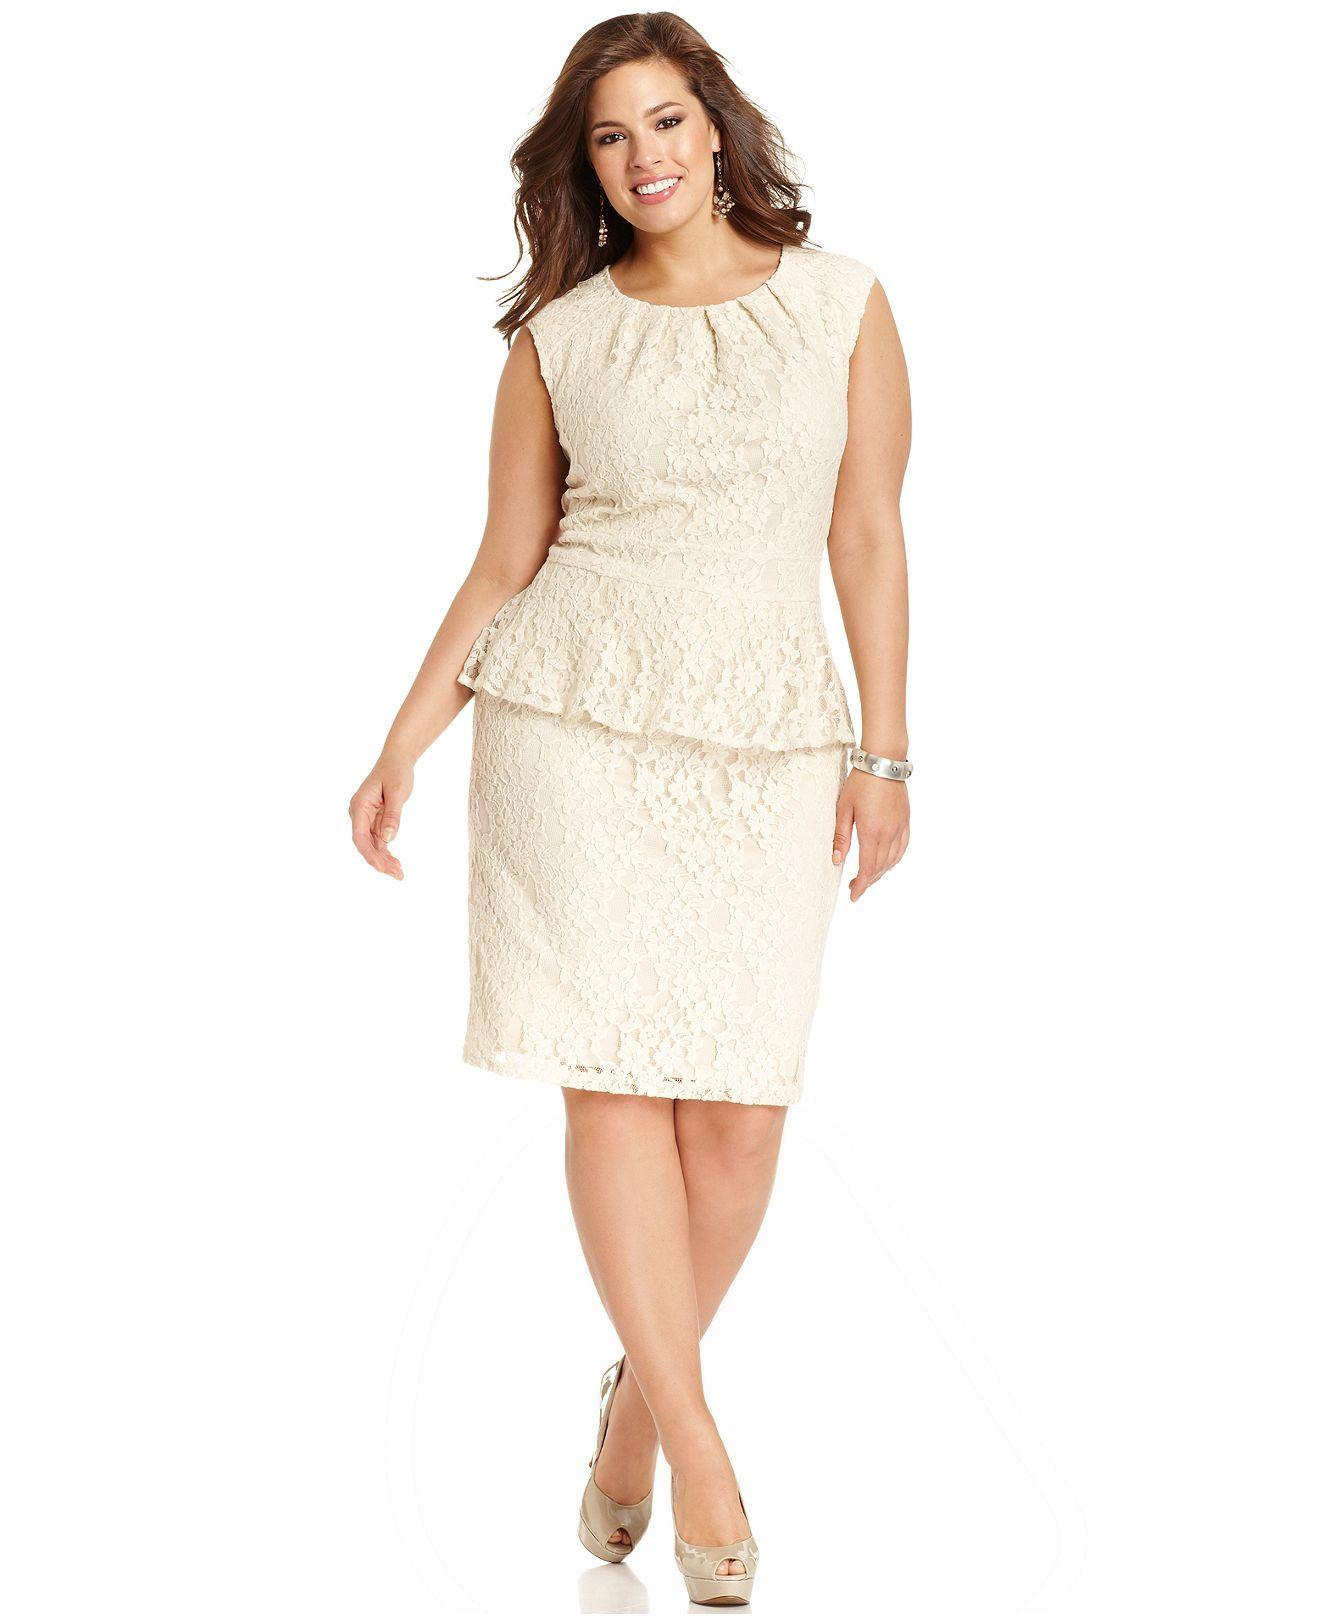 2f3cb3c45a7d Spense Plus Size Dress, Cap-Sleeve Lace Pleated Peplum - Plus Size Dresses  - Plus Sizes - Macy's $89